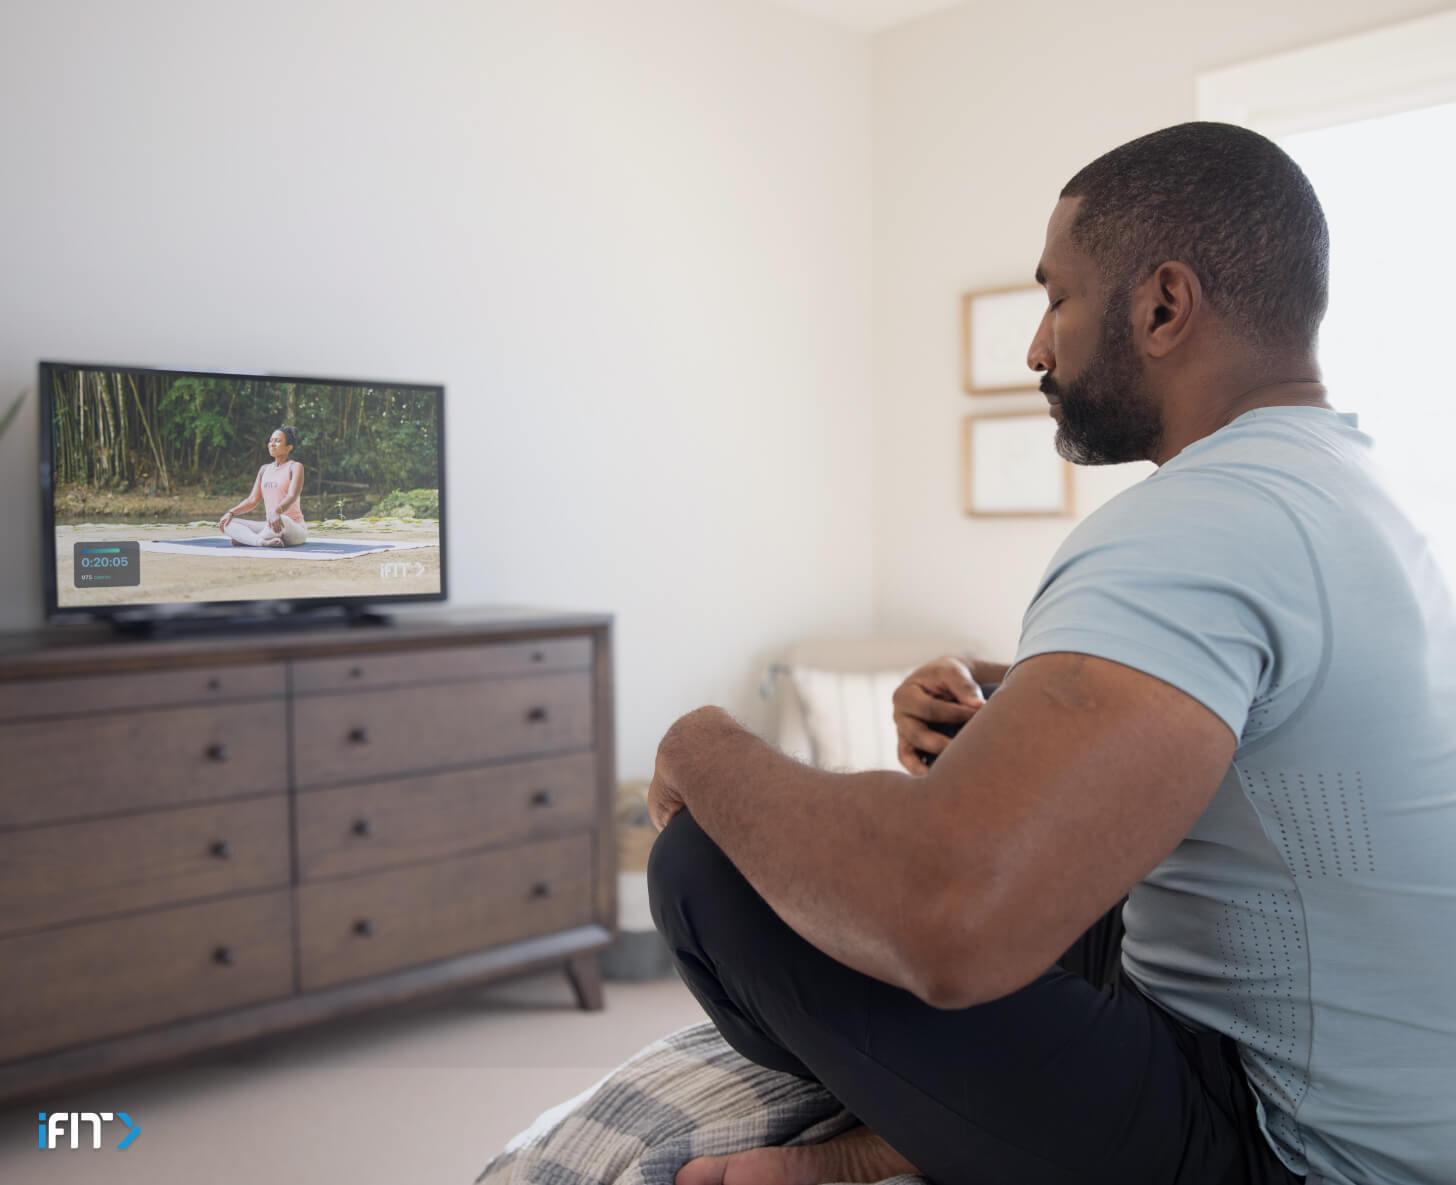 Man completes an iFIT mindfulness class